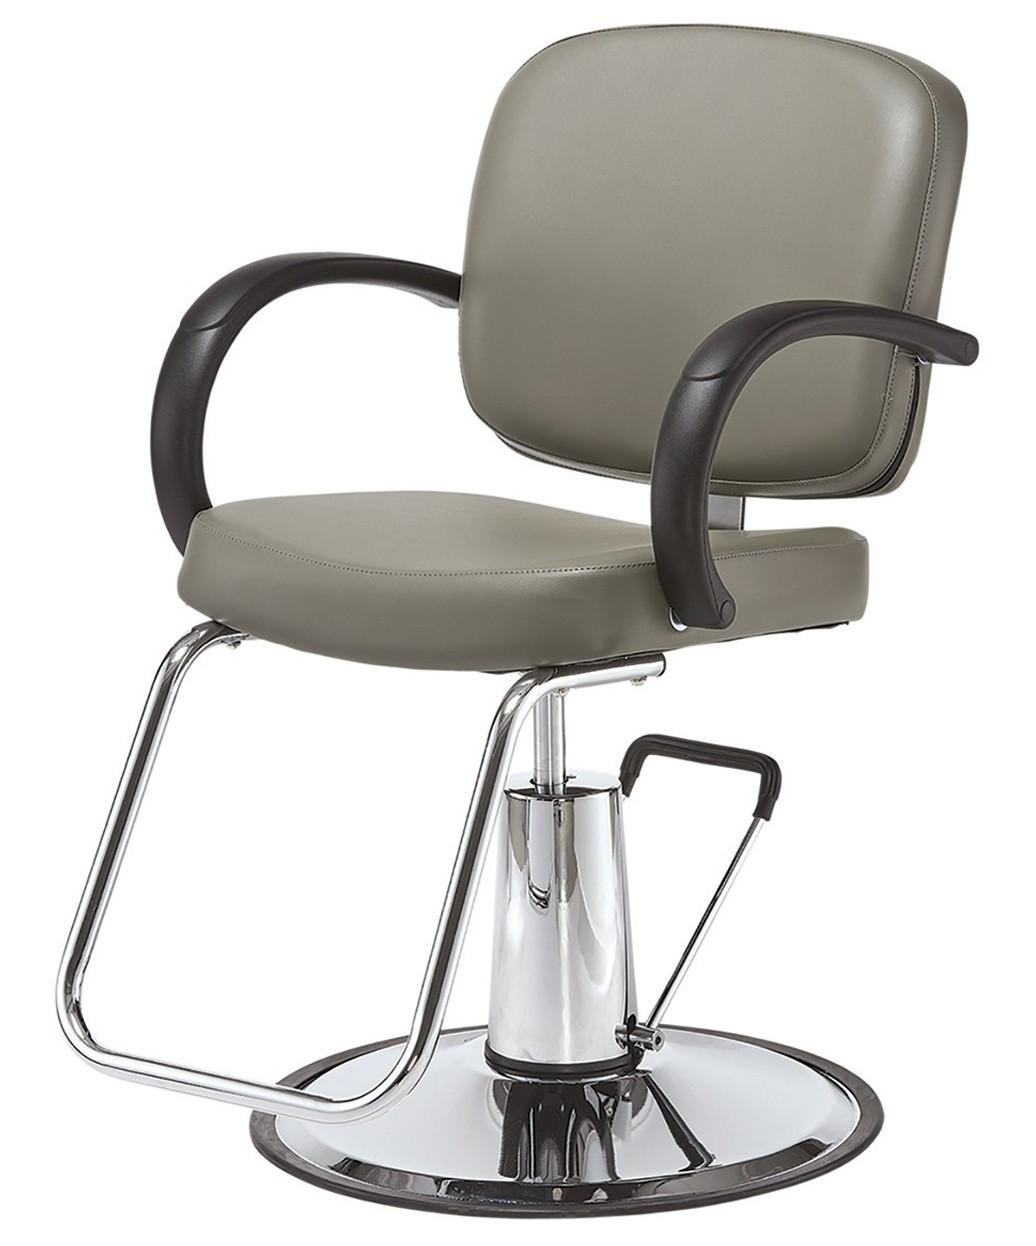 4 Operator Pibbs 3606 Messina Salon Package Pibbs 3606 Messina Styling Chair